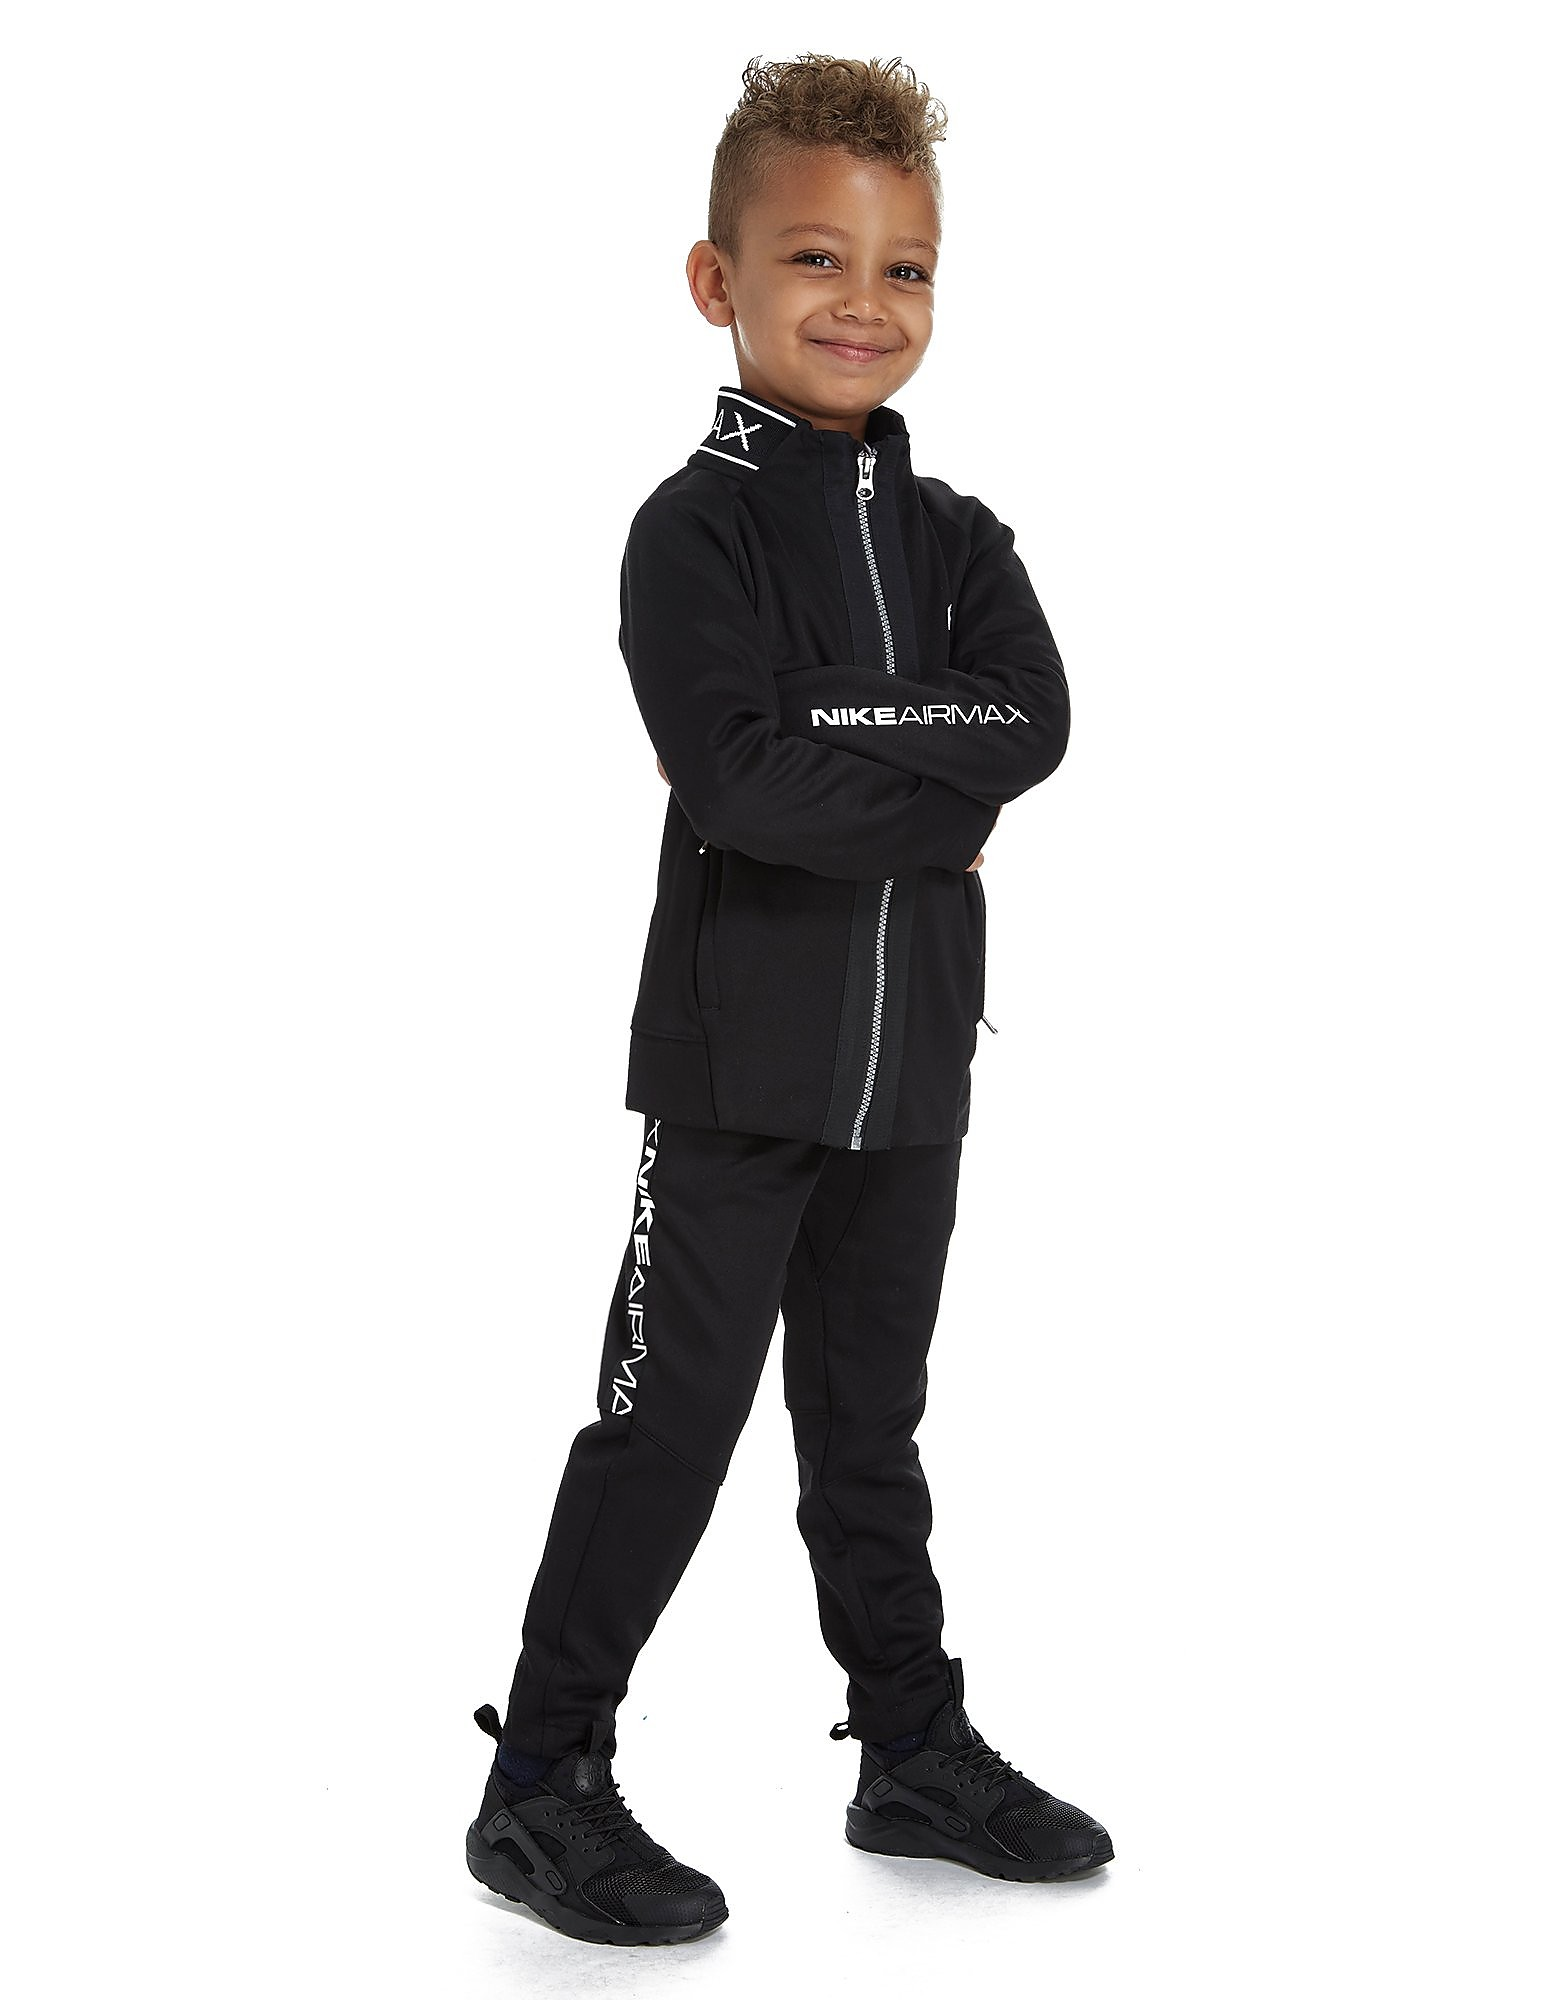 Nike Air Max Tracksuit Children